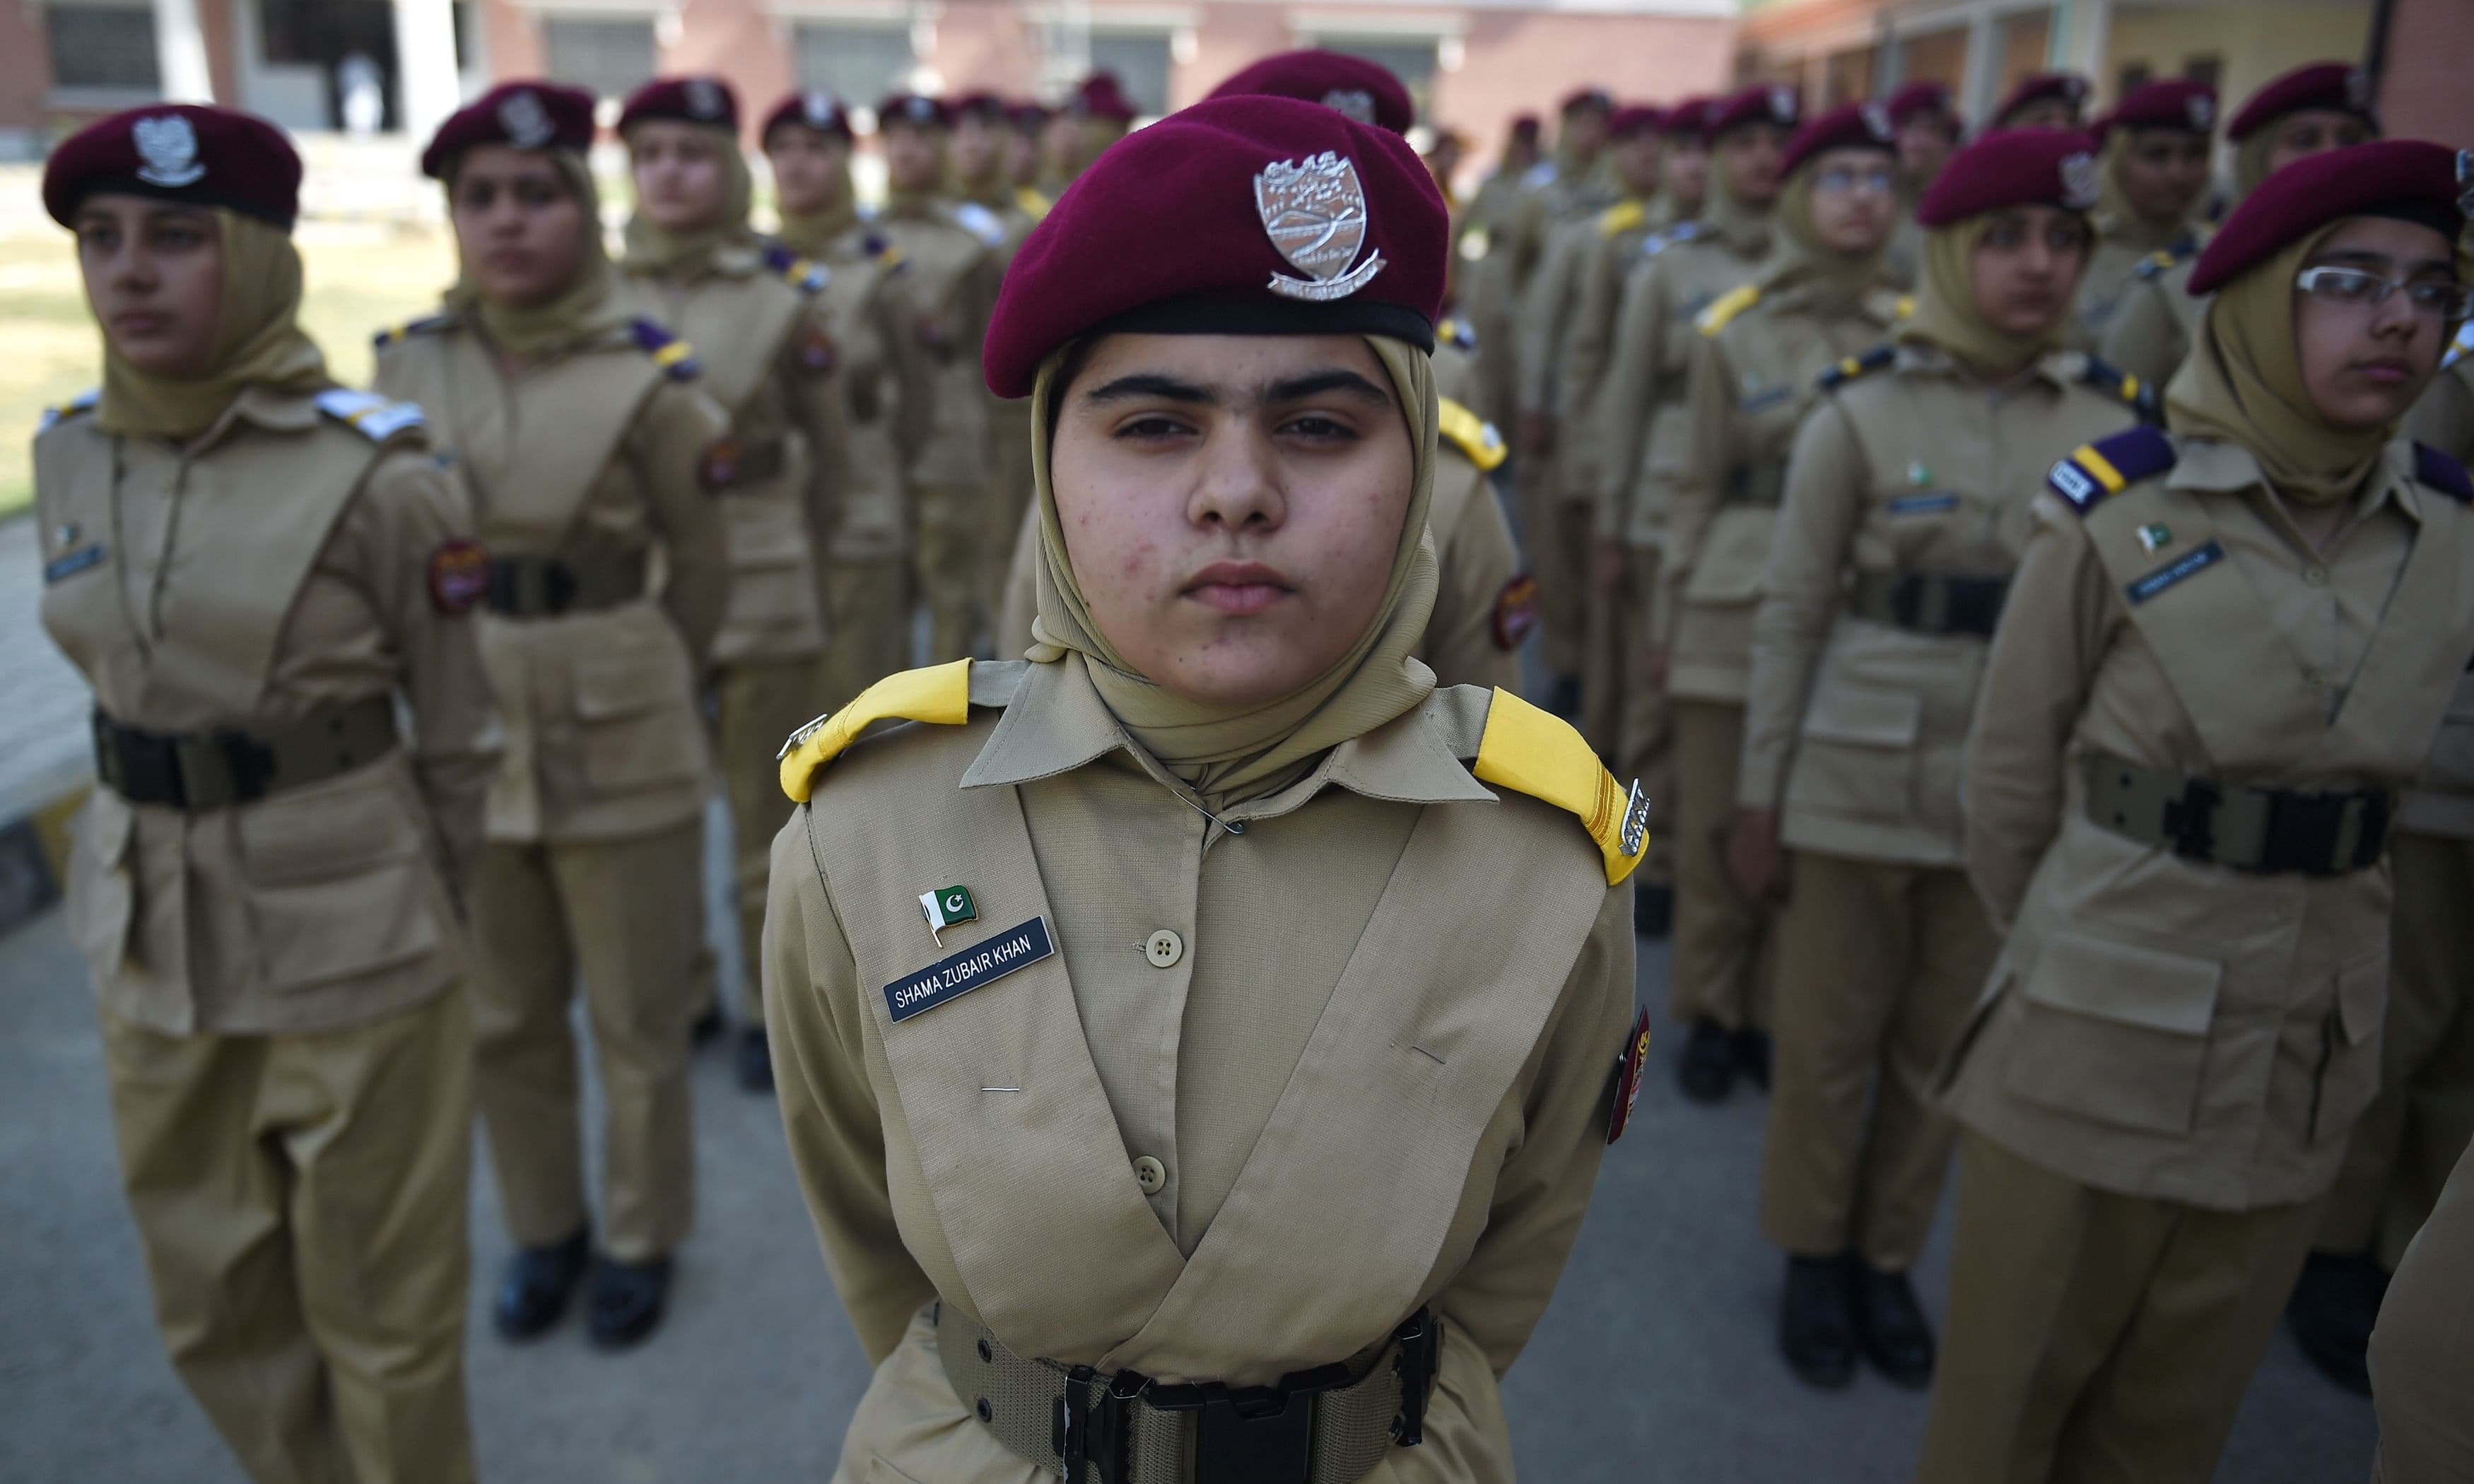 How to enter a cadet school